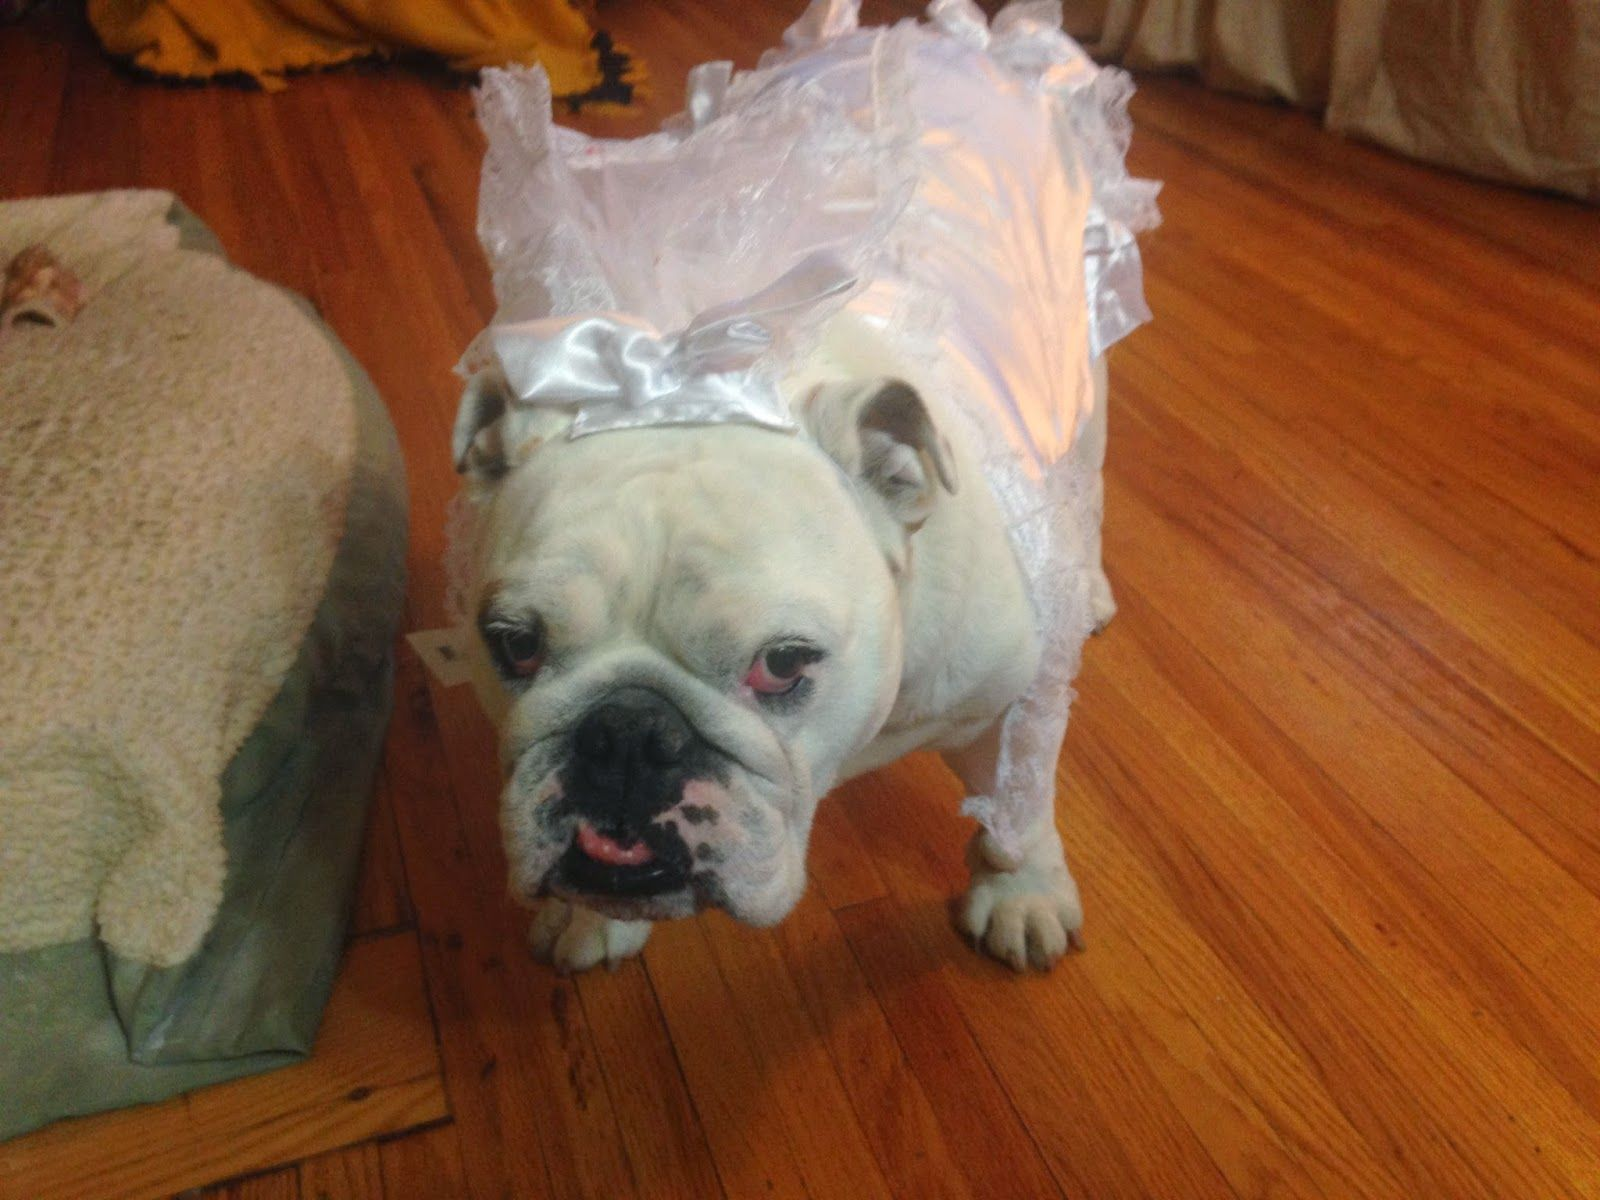 The Bulldog Brigade: I'm Not Intentionally Abusing Them...